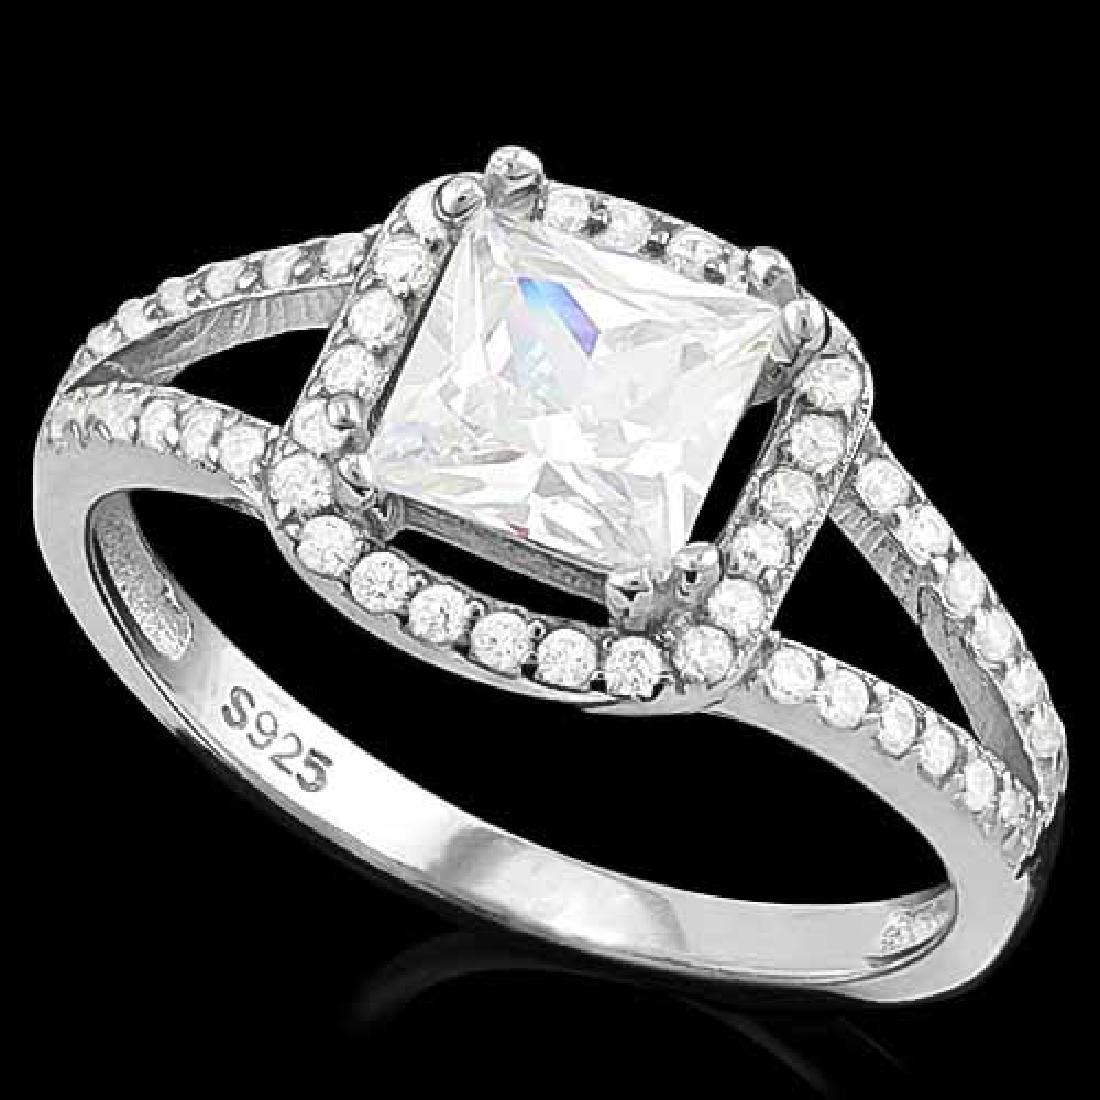 1.50 CT CREATED DIAMOND & 56PCS CREATED DIAMOND 925 STE